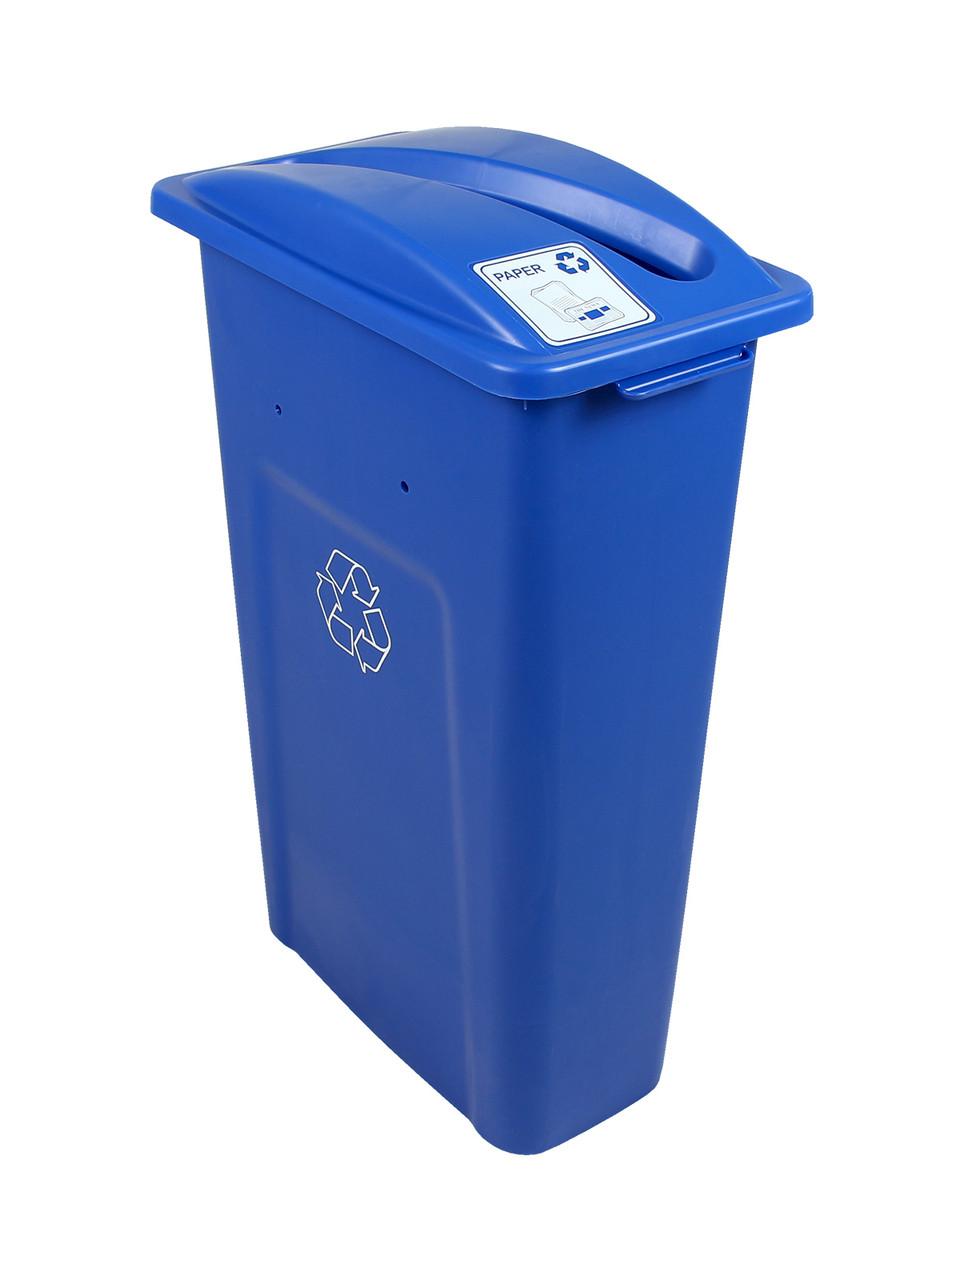 23 Gallon Blue Skinny Simple Sort Recycle Bin (Paper)